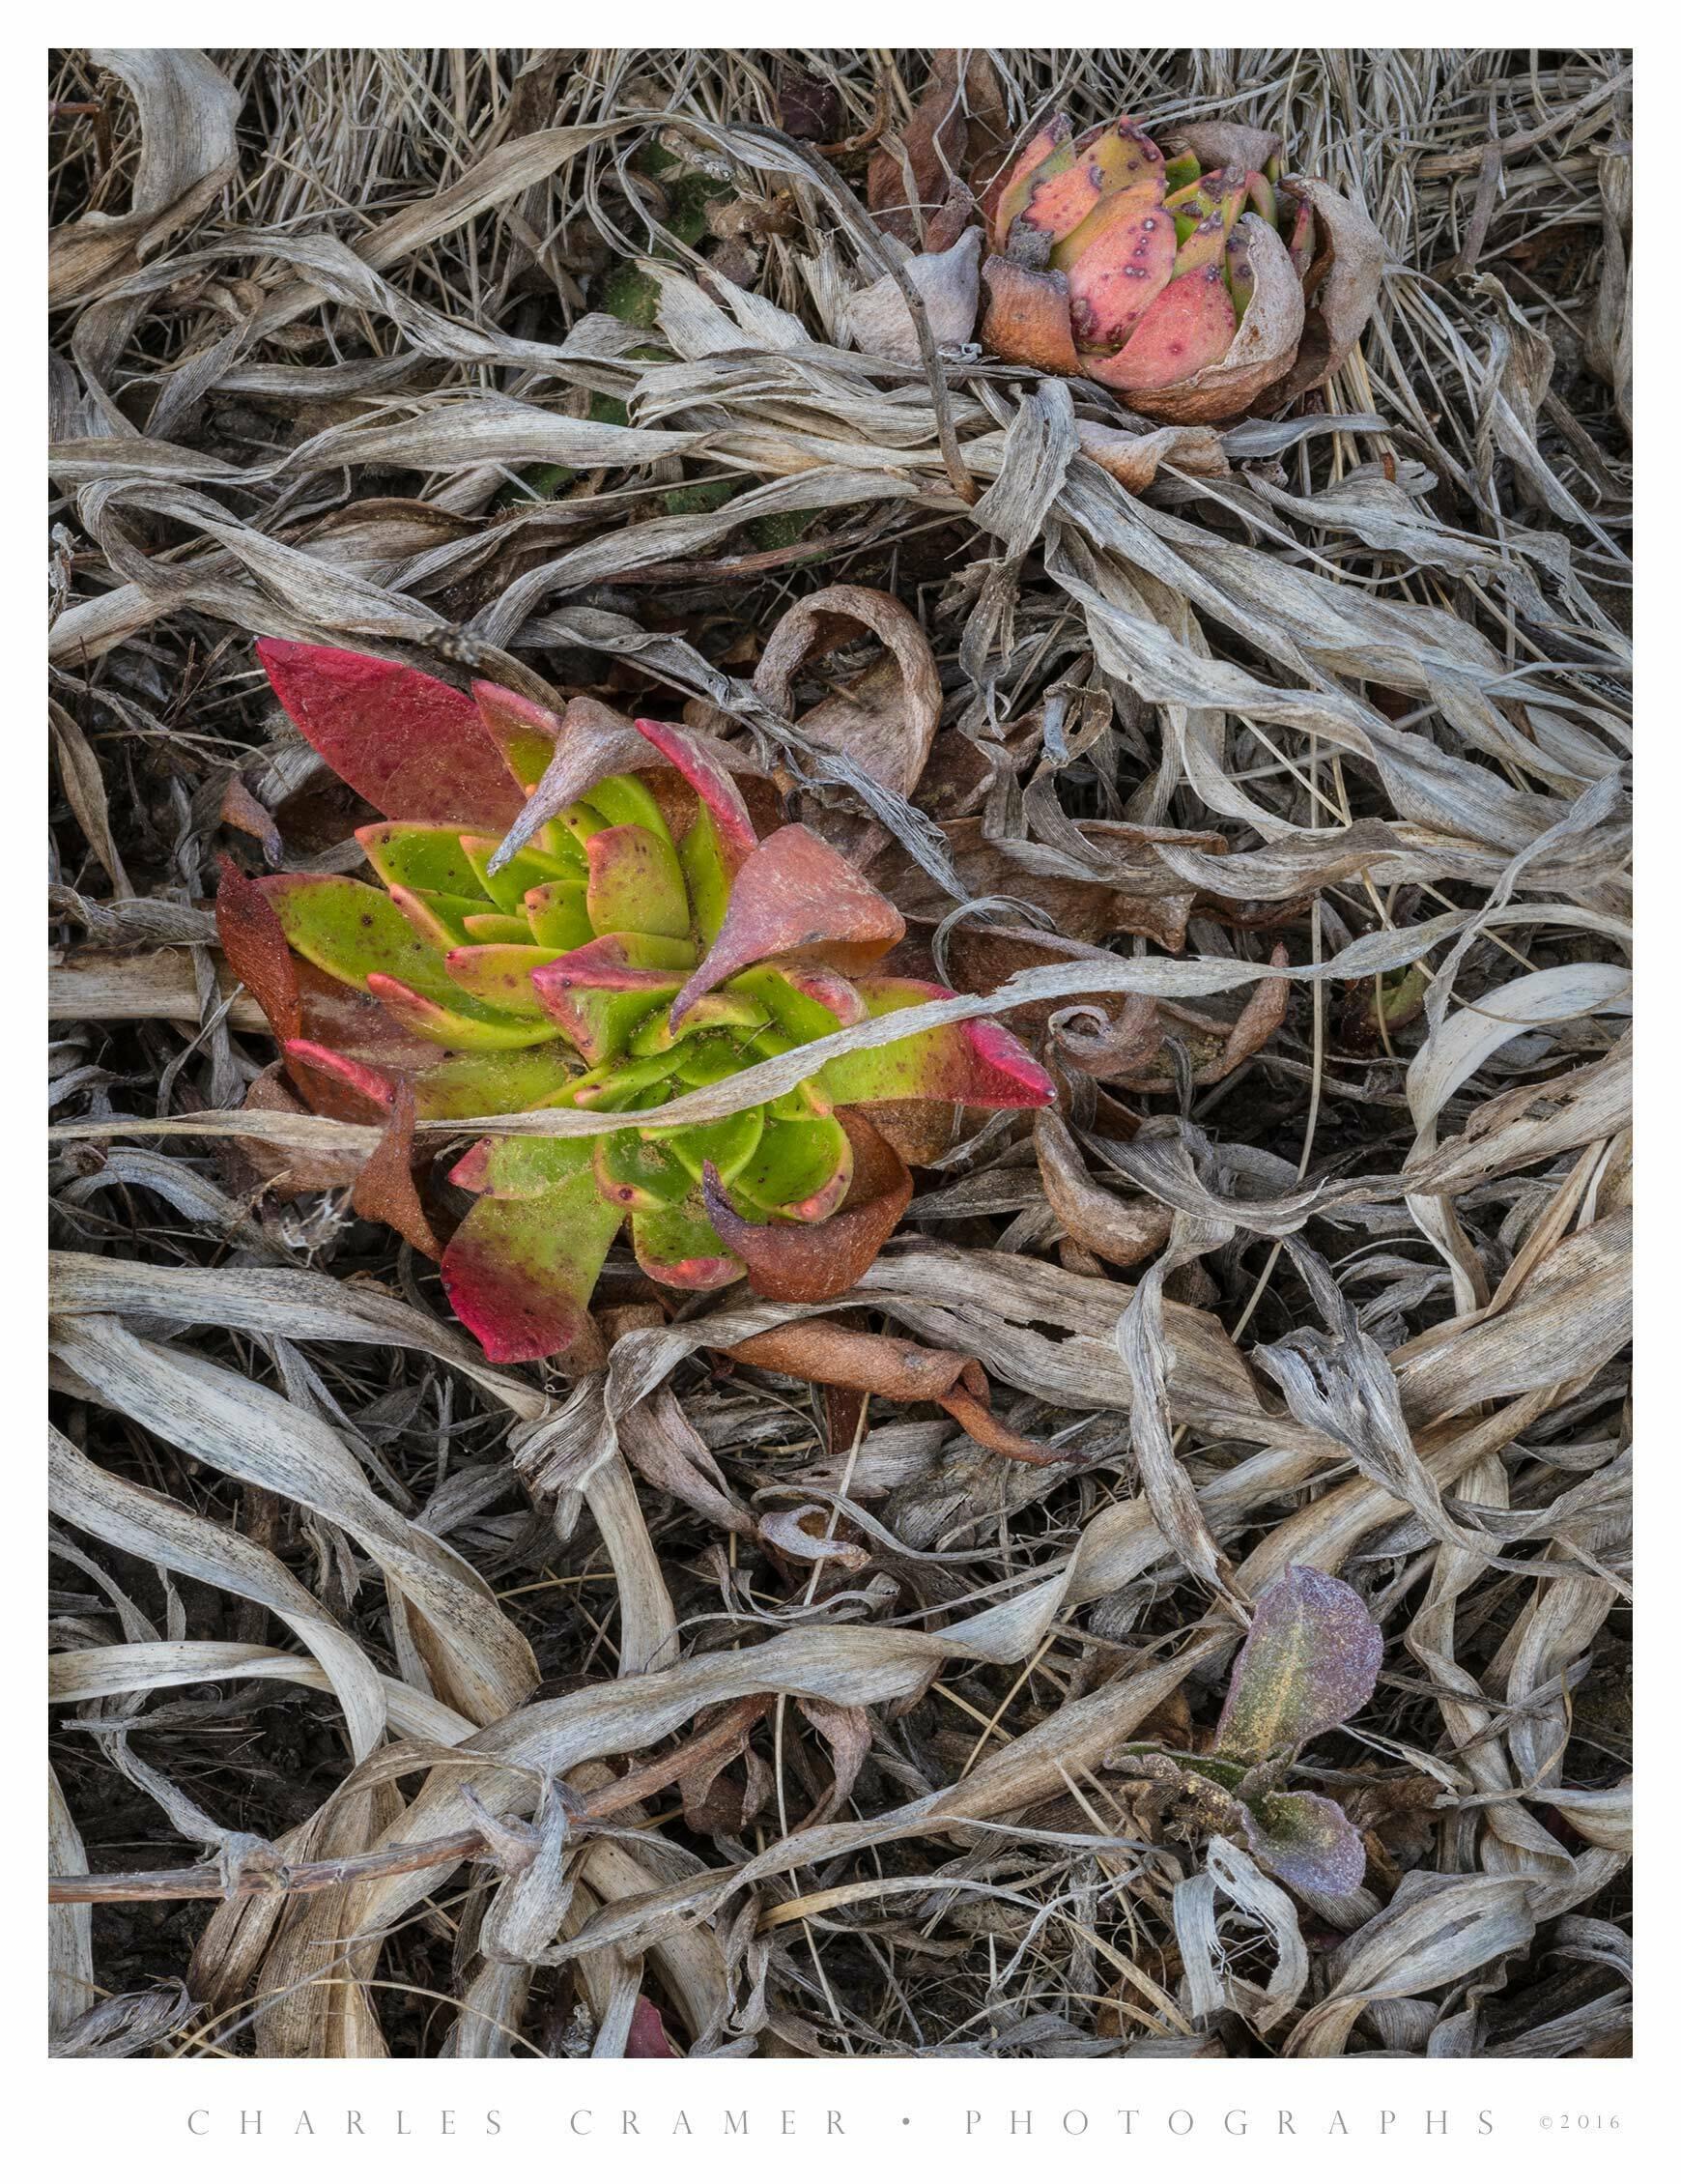 Iceplant, San Mateo Coast, California